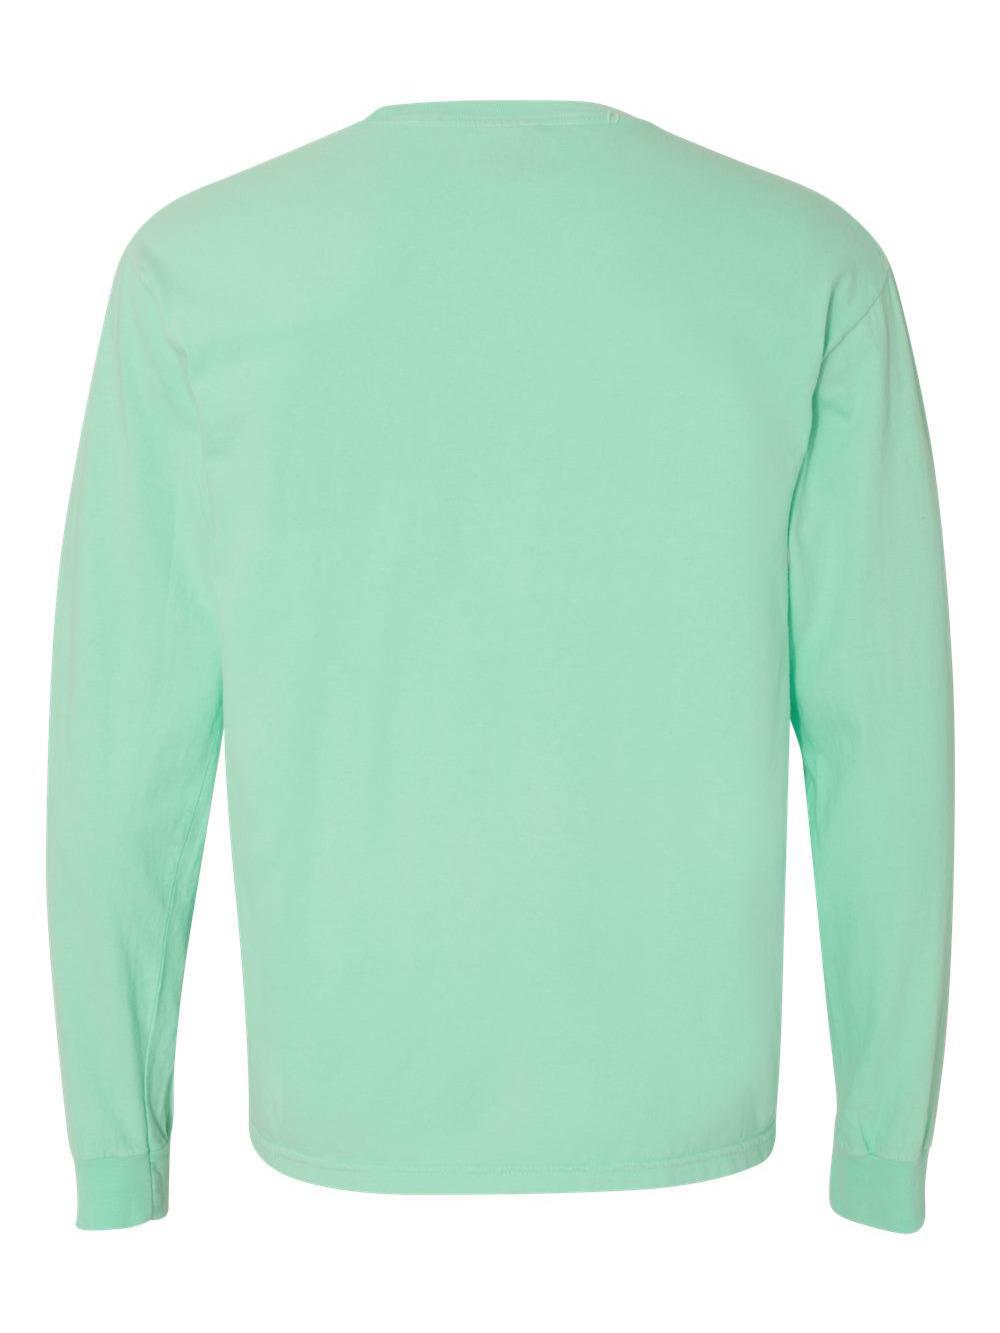 Comfort-Colors-Garment-Dyed-Heavyweight-Ringspun-Long-Sleeve-T-Shirt-6014 thumbnail 43